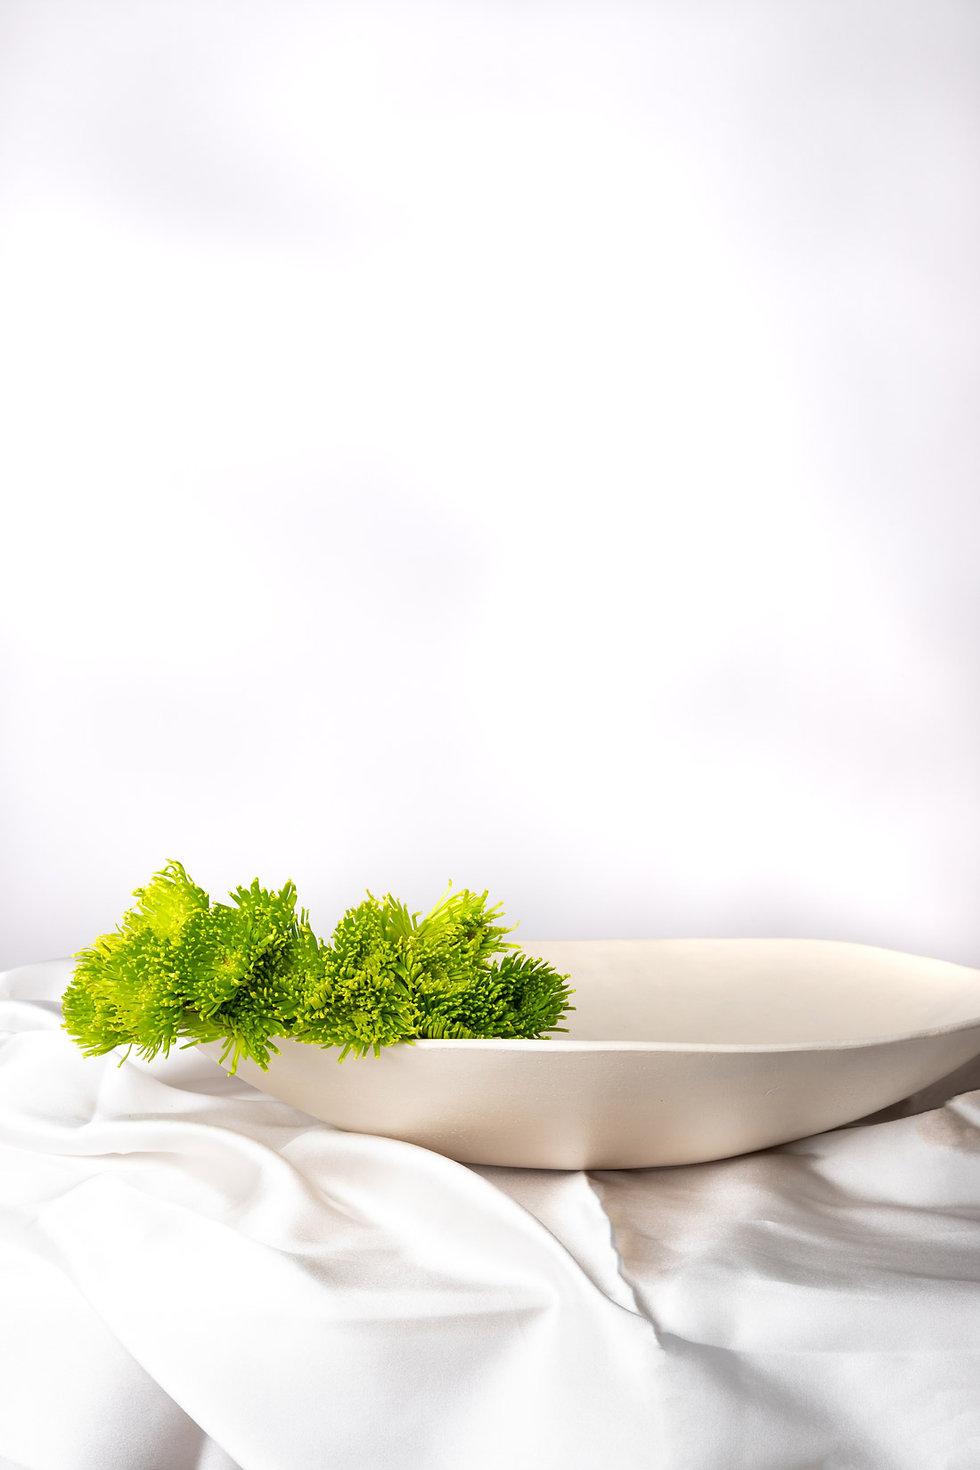 Natural asthetik original products stillness bowl, luxury home decor